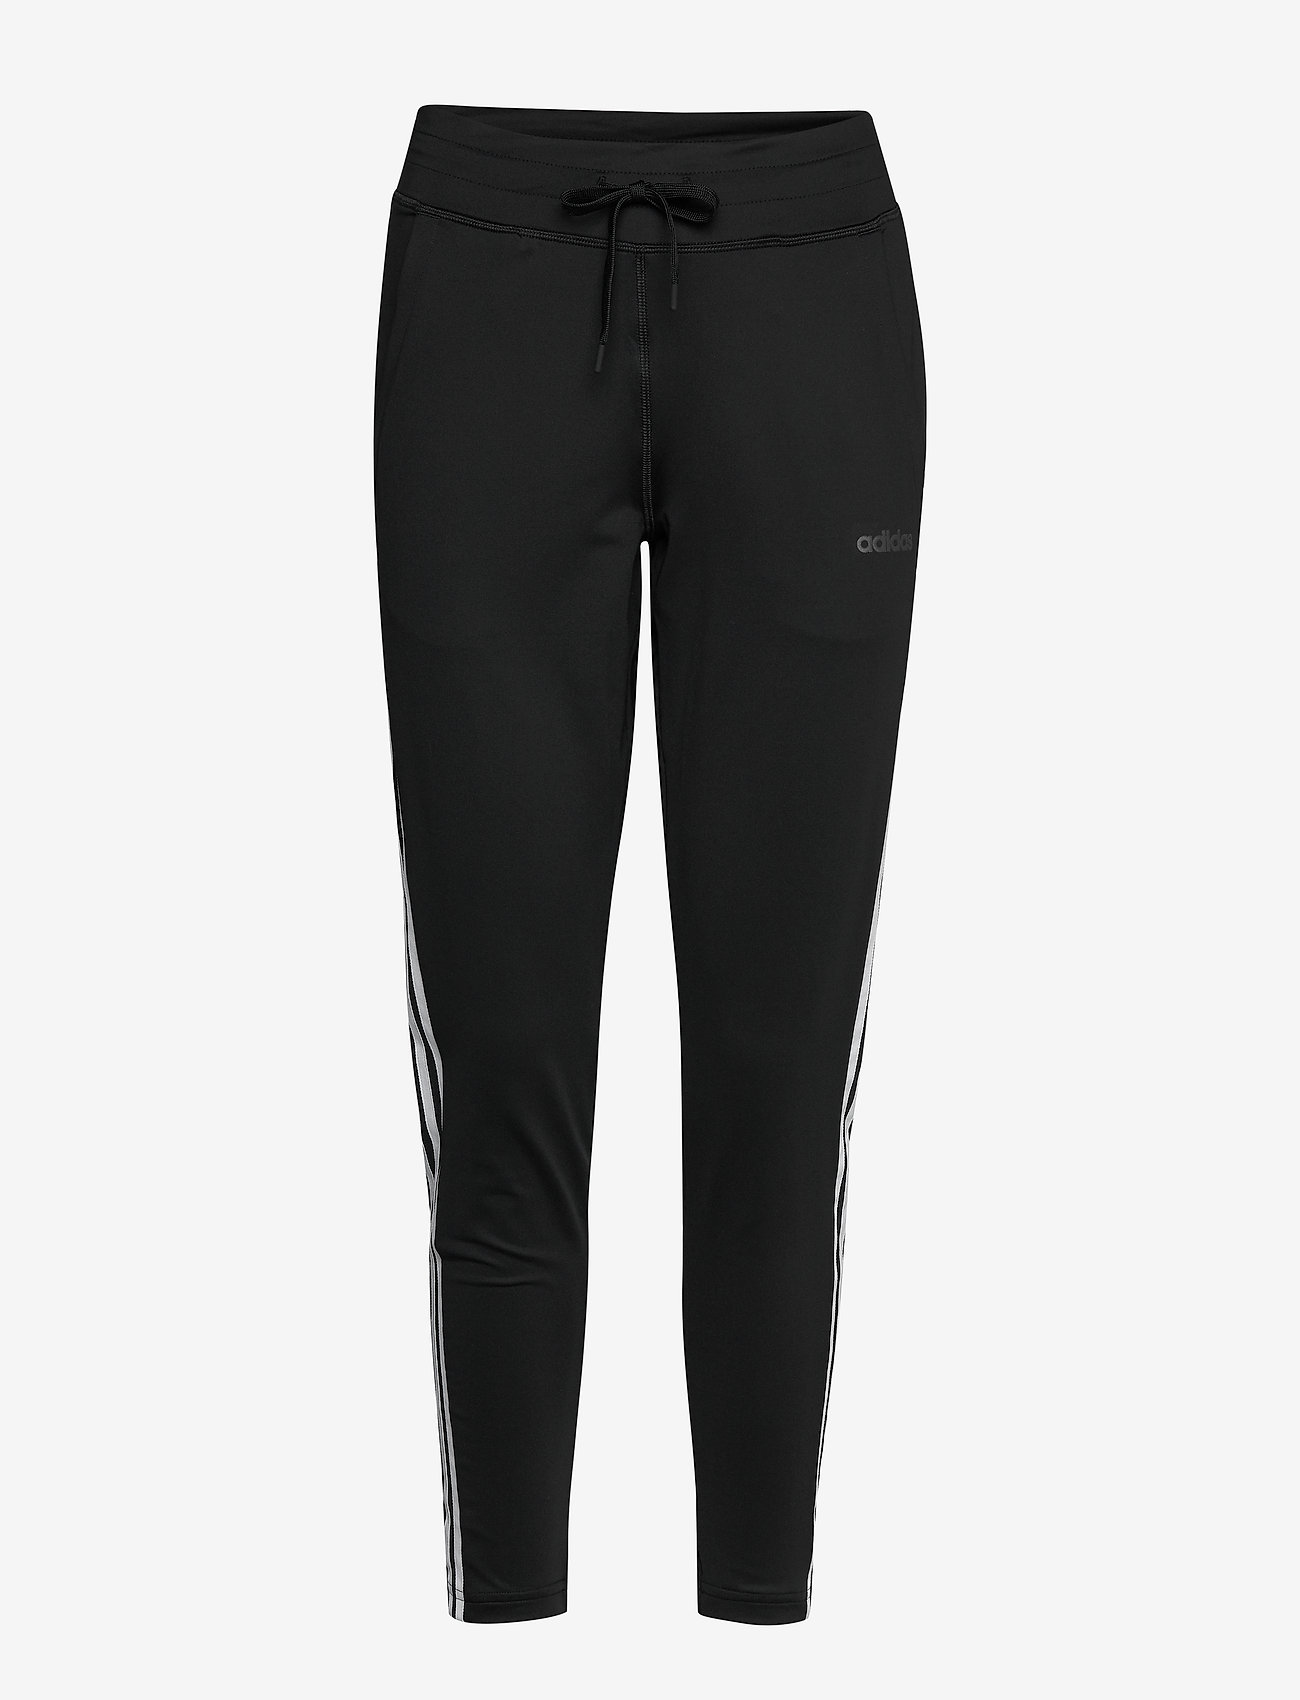 adidas Performance - Design 2 Move 3-Stripes Pants W - pantalon de sport - black/white - 1